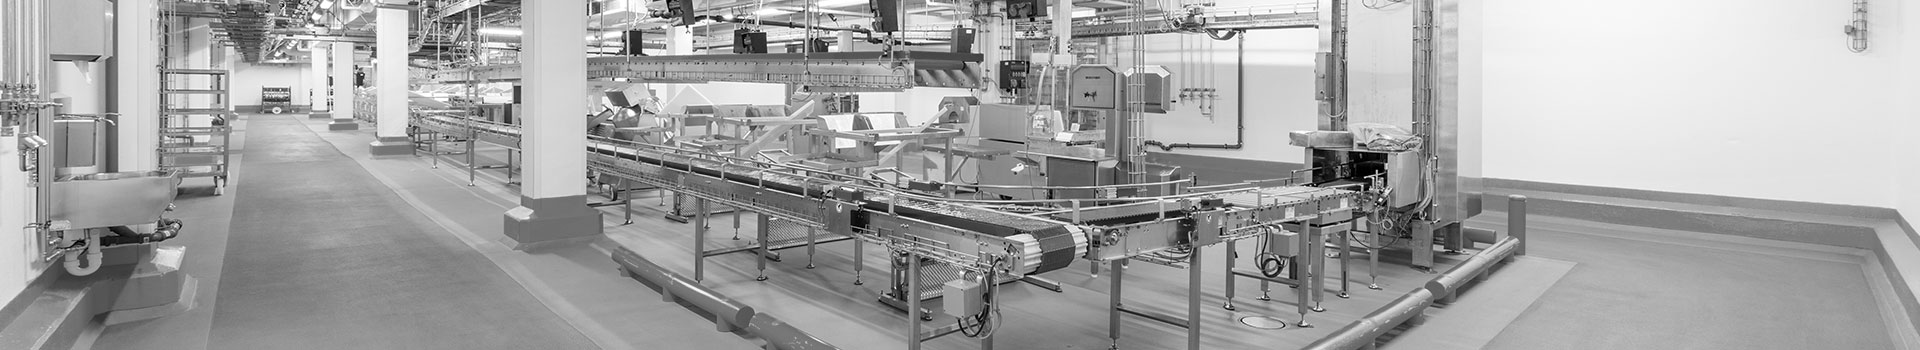 Industriebodenbeläge - Knöller - Bild